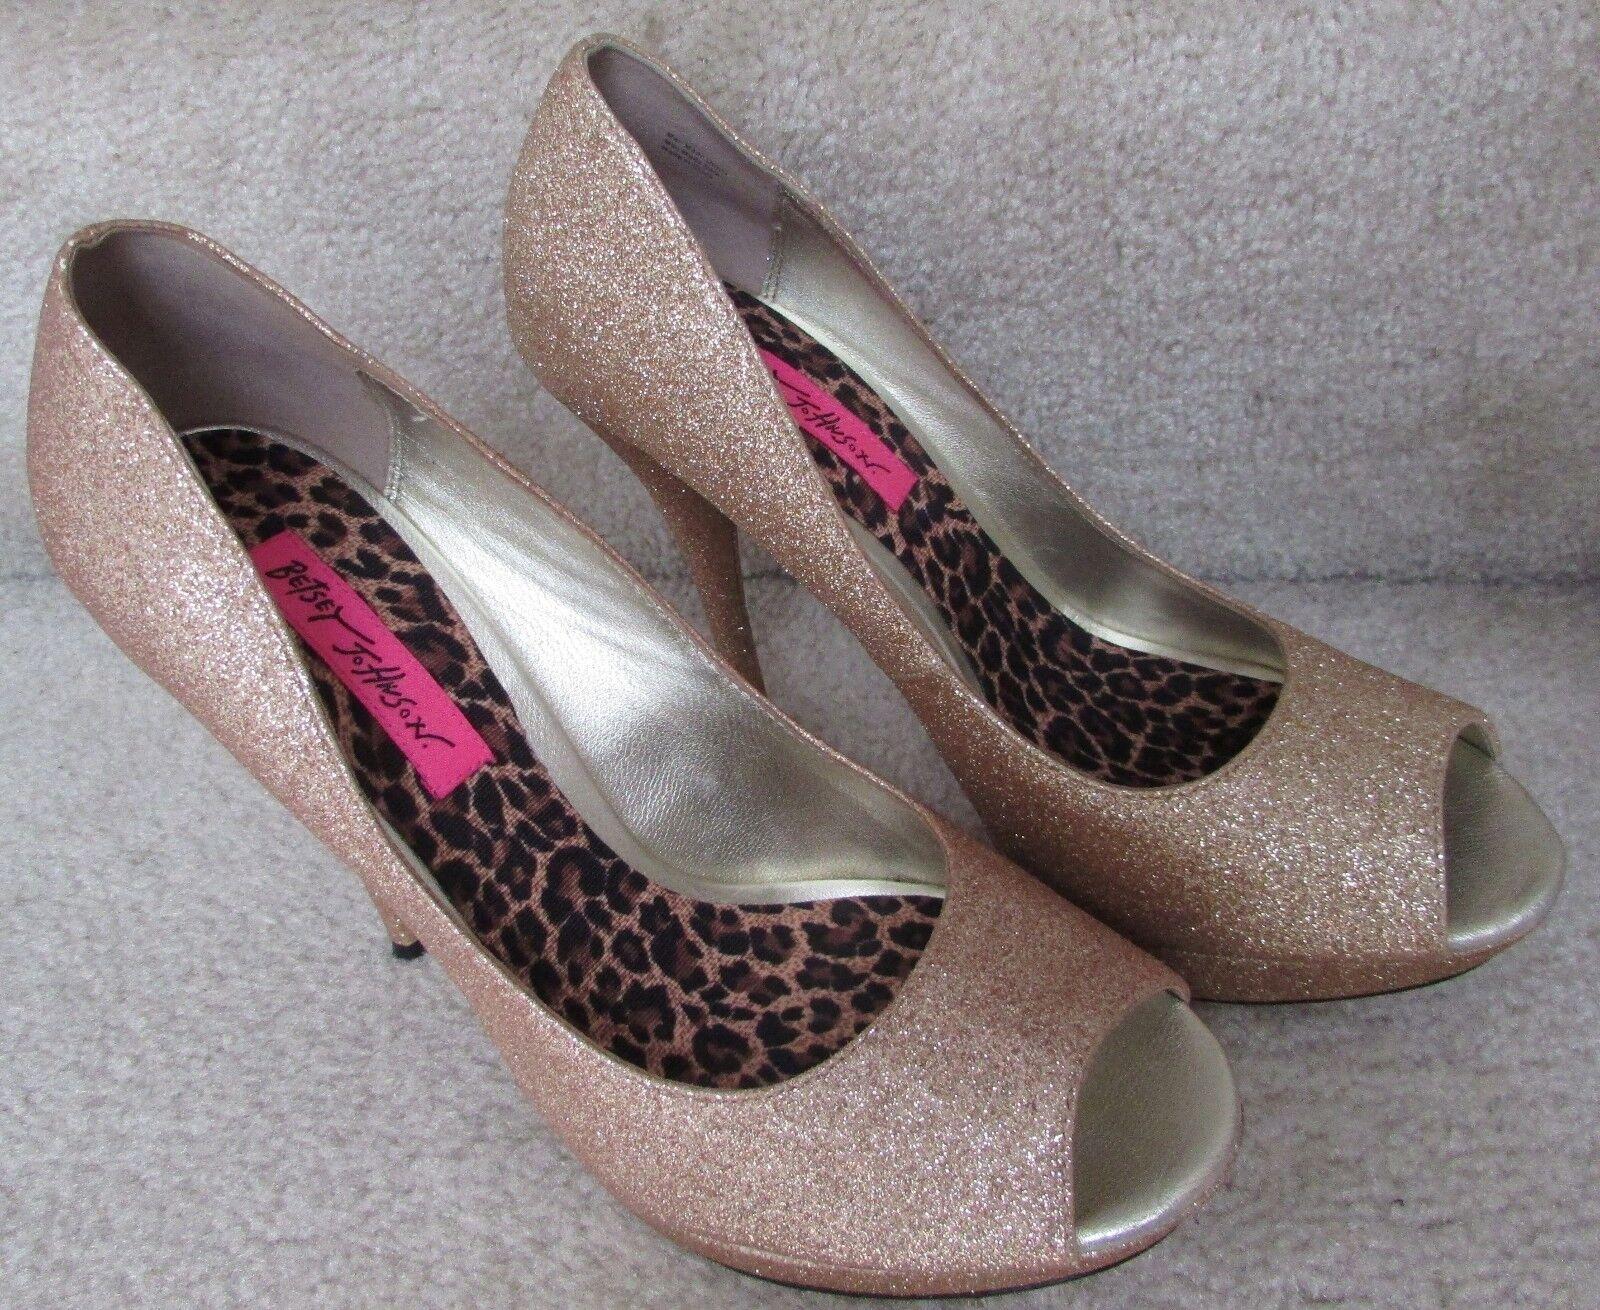 Betsey Johnson Womens Gold Glitter Platform Pumps Shoes 9M EUC